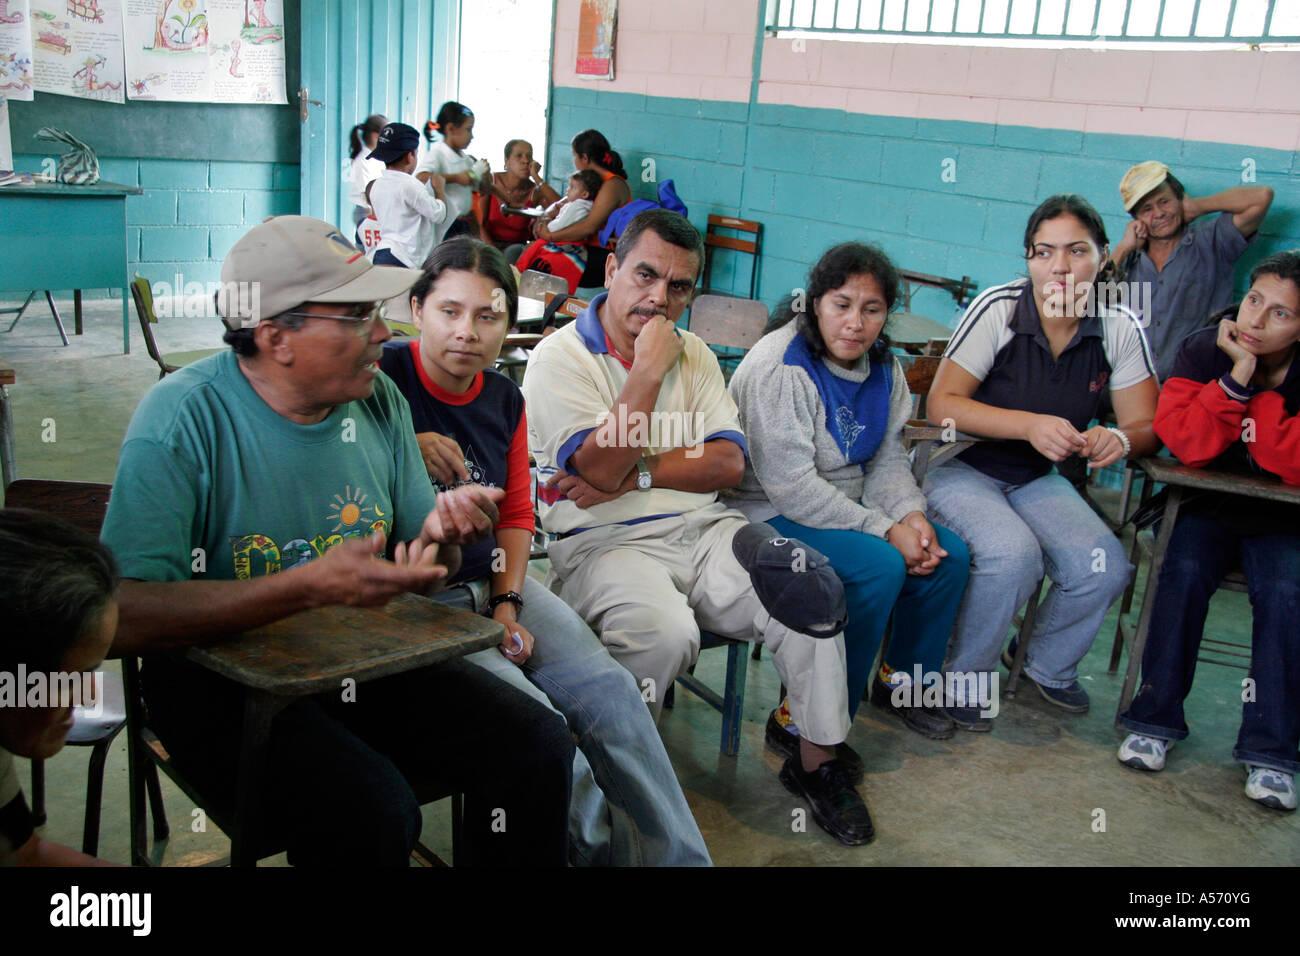 Painet ja1237 venezuela meeting teachers parents primary school village chamiza lara state latin america south 20051001 - Stock Image